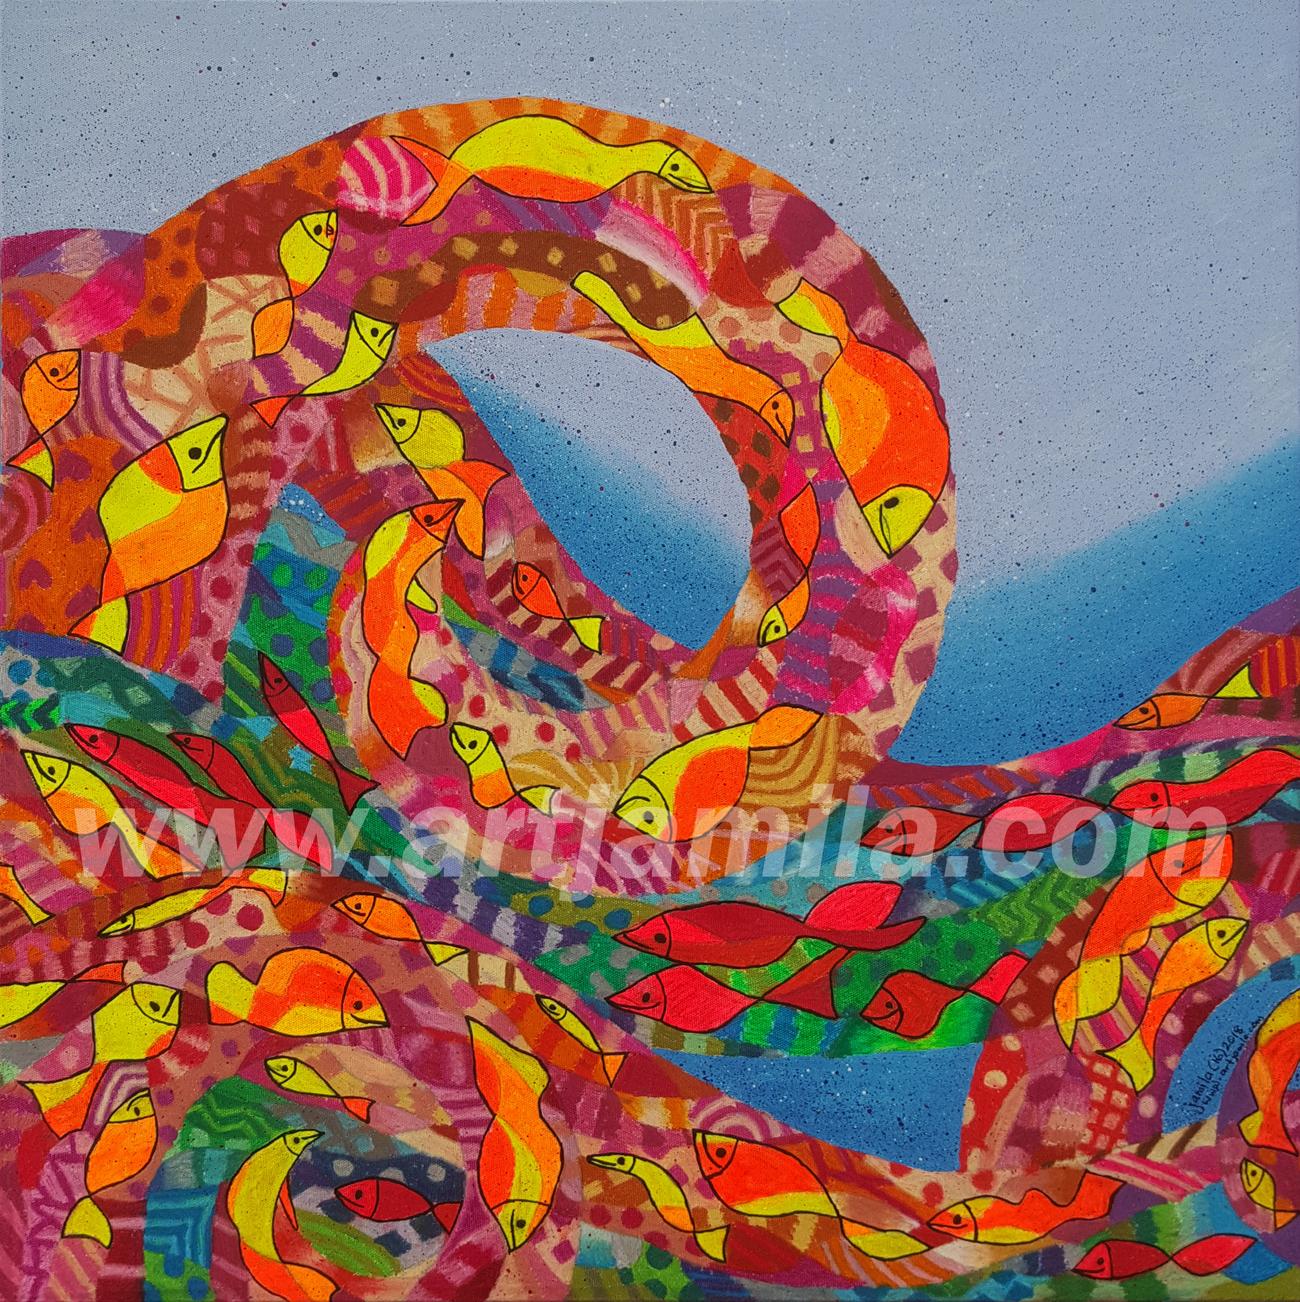 Fishmosaic Wave Series 2B. Watermark